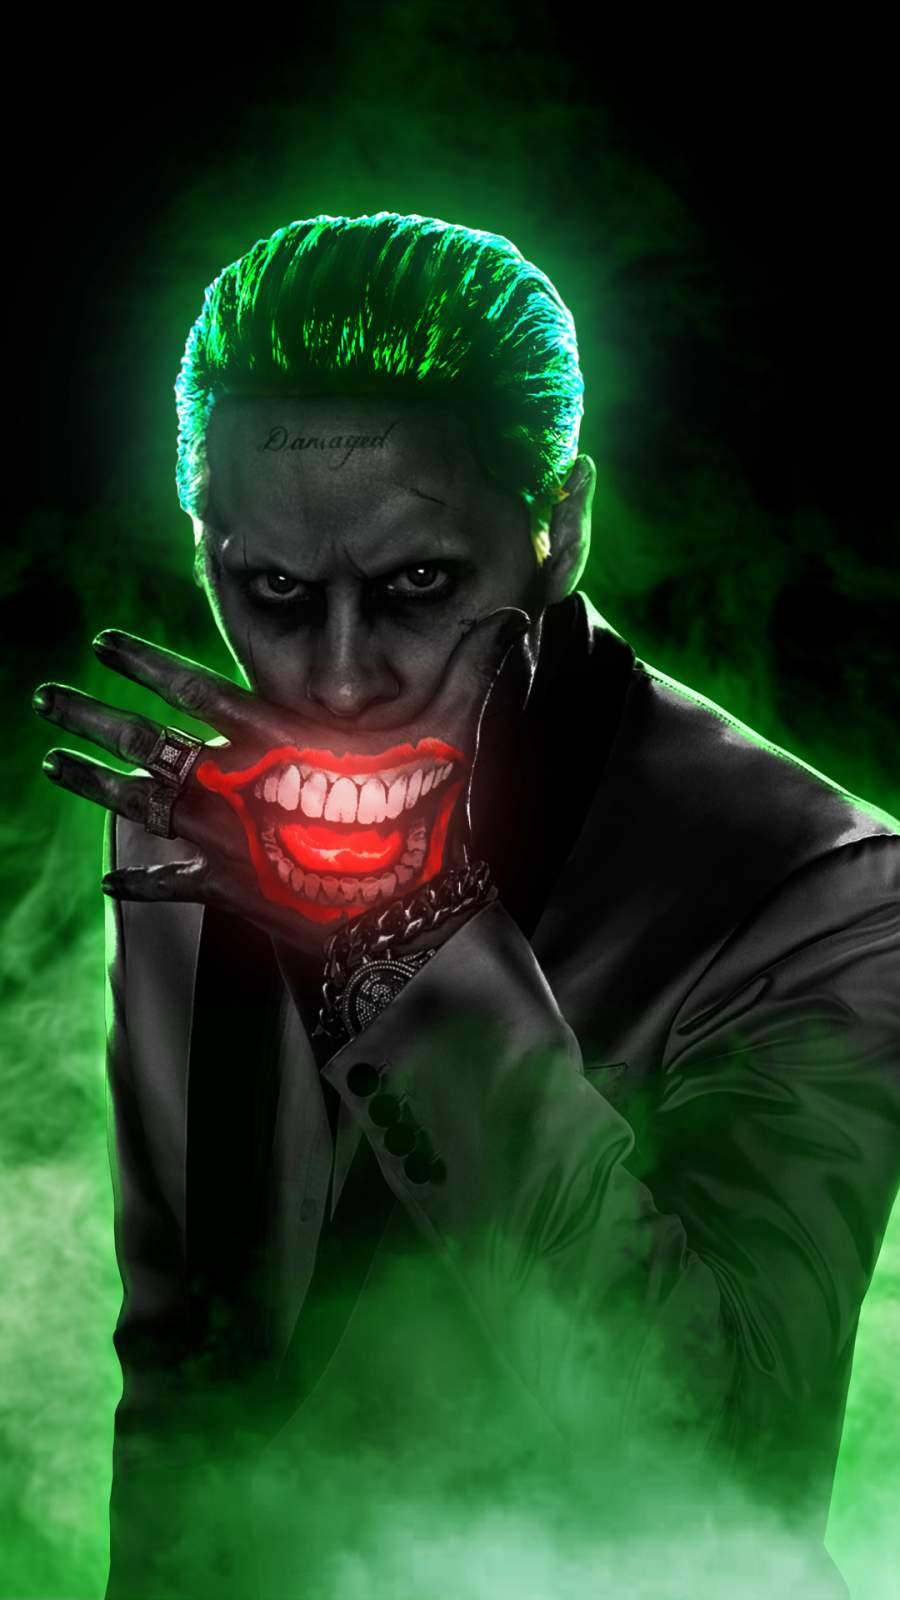 Jared Leto Joker iPhone Wallpaper